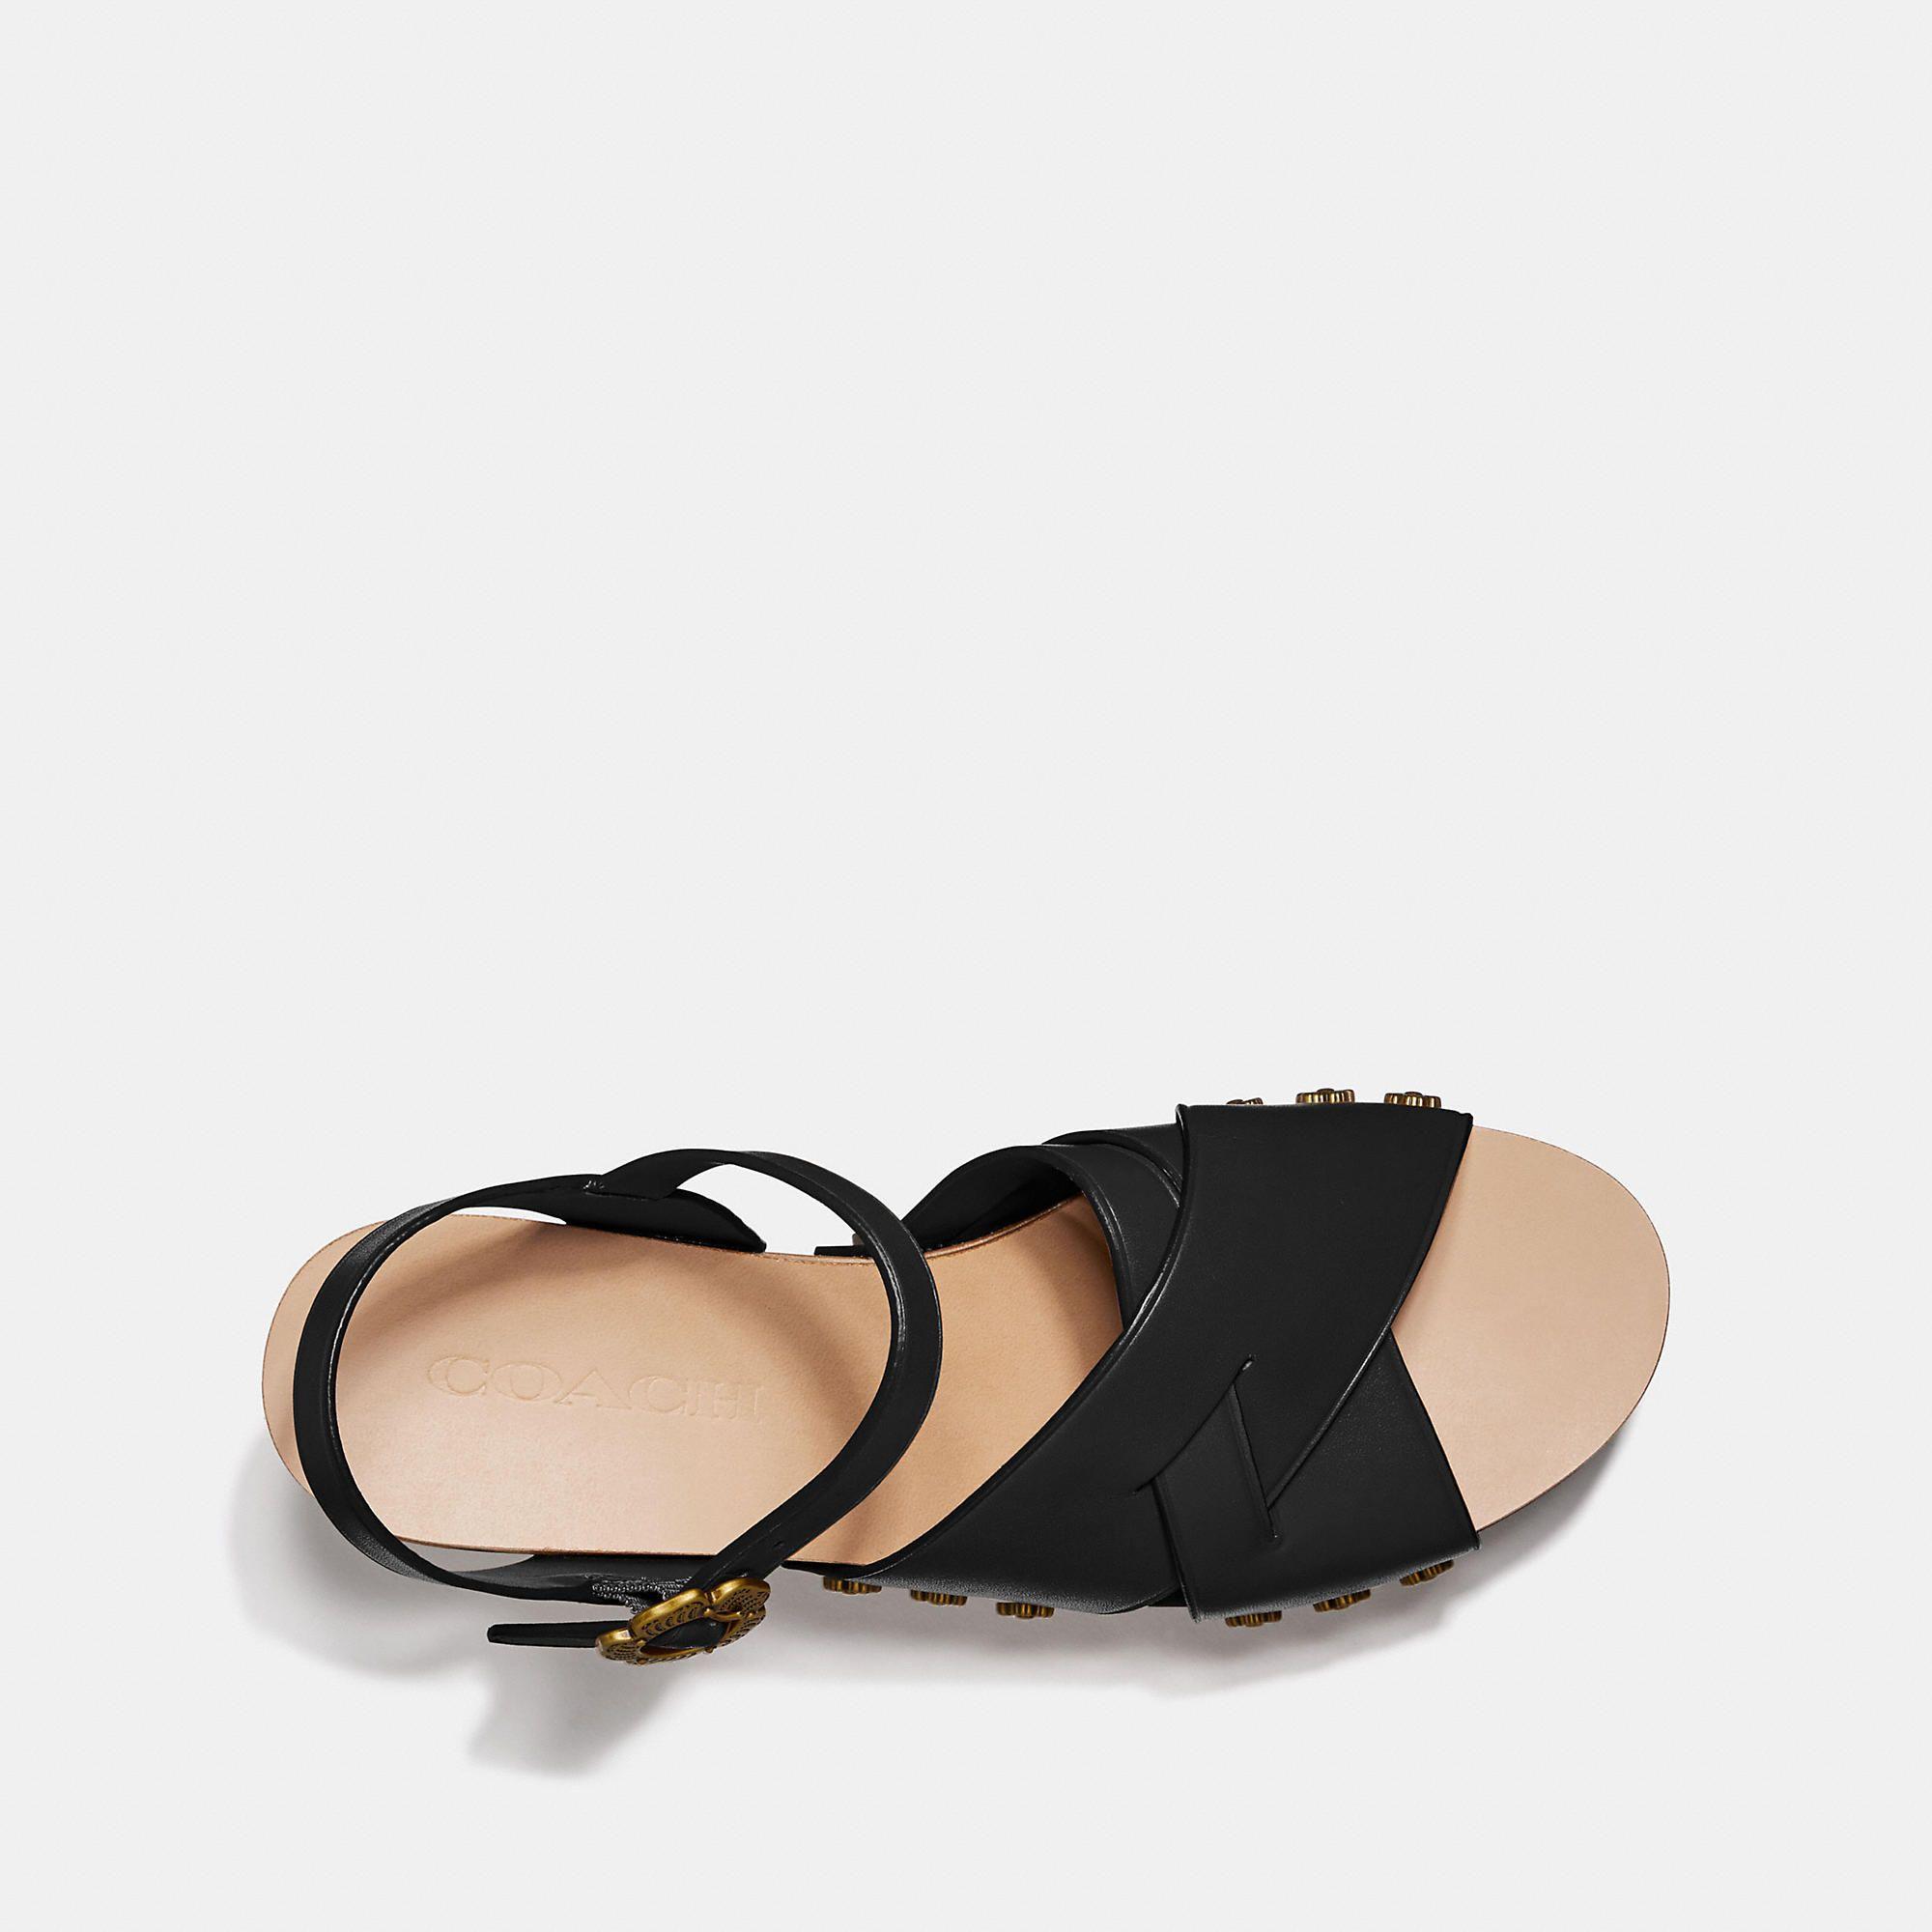 c8bdf92d13 COACH Nessa Clog Sandal - Women's Size 6.5 Clogs in 2019 | Products ...